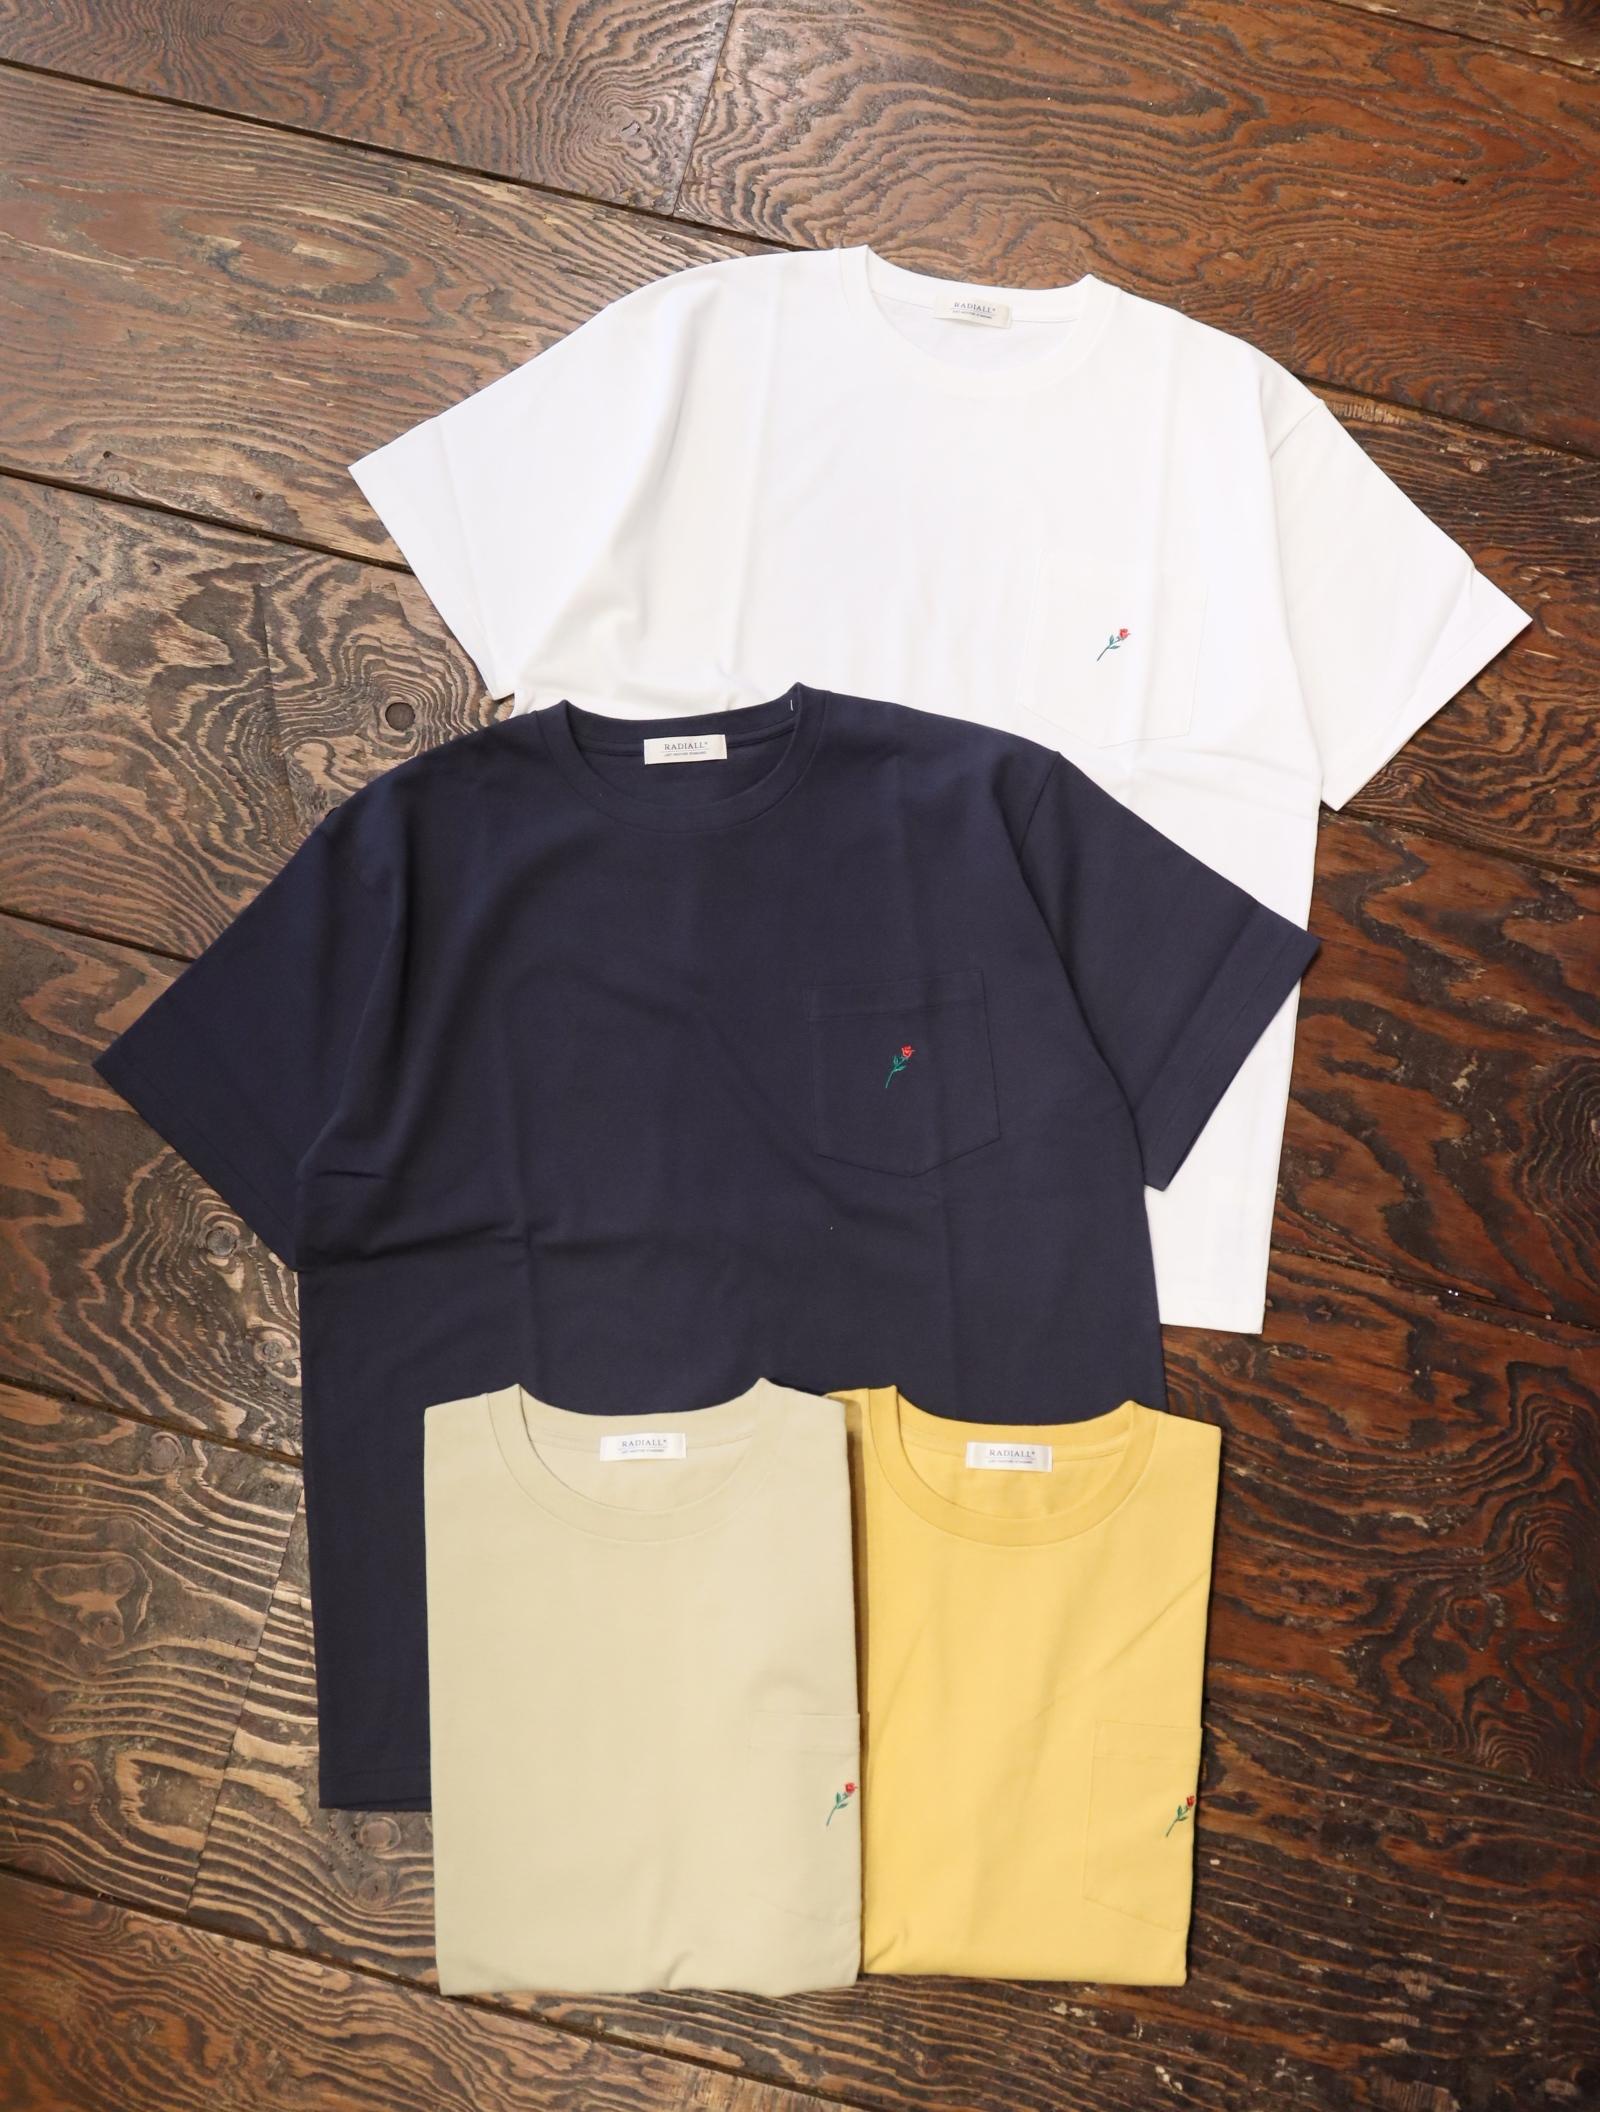 RADIALL  「ROSE - CREW NECK POCKET T-SHIRT S/S」  ポケットティーシャツ